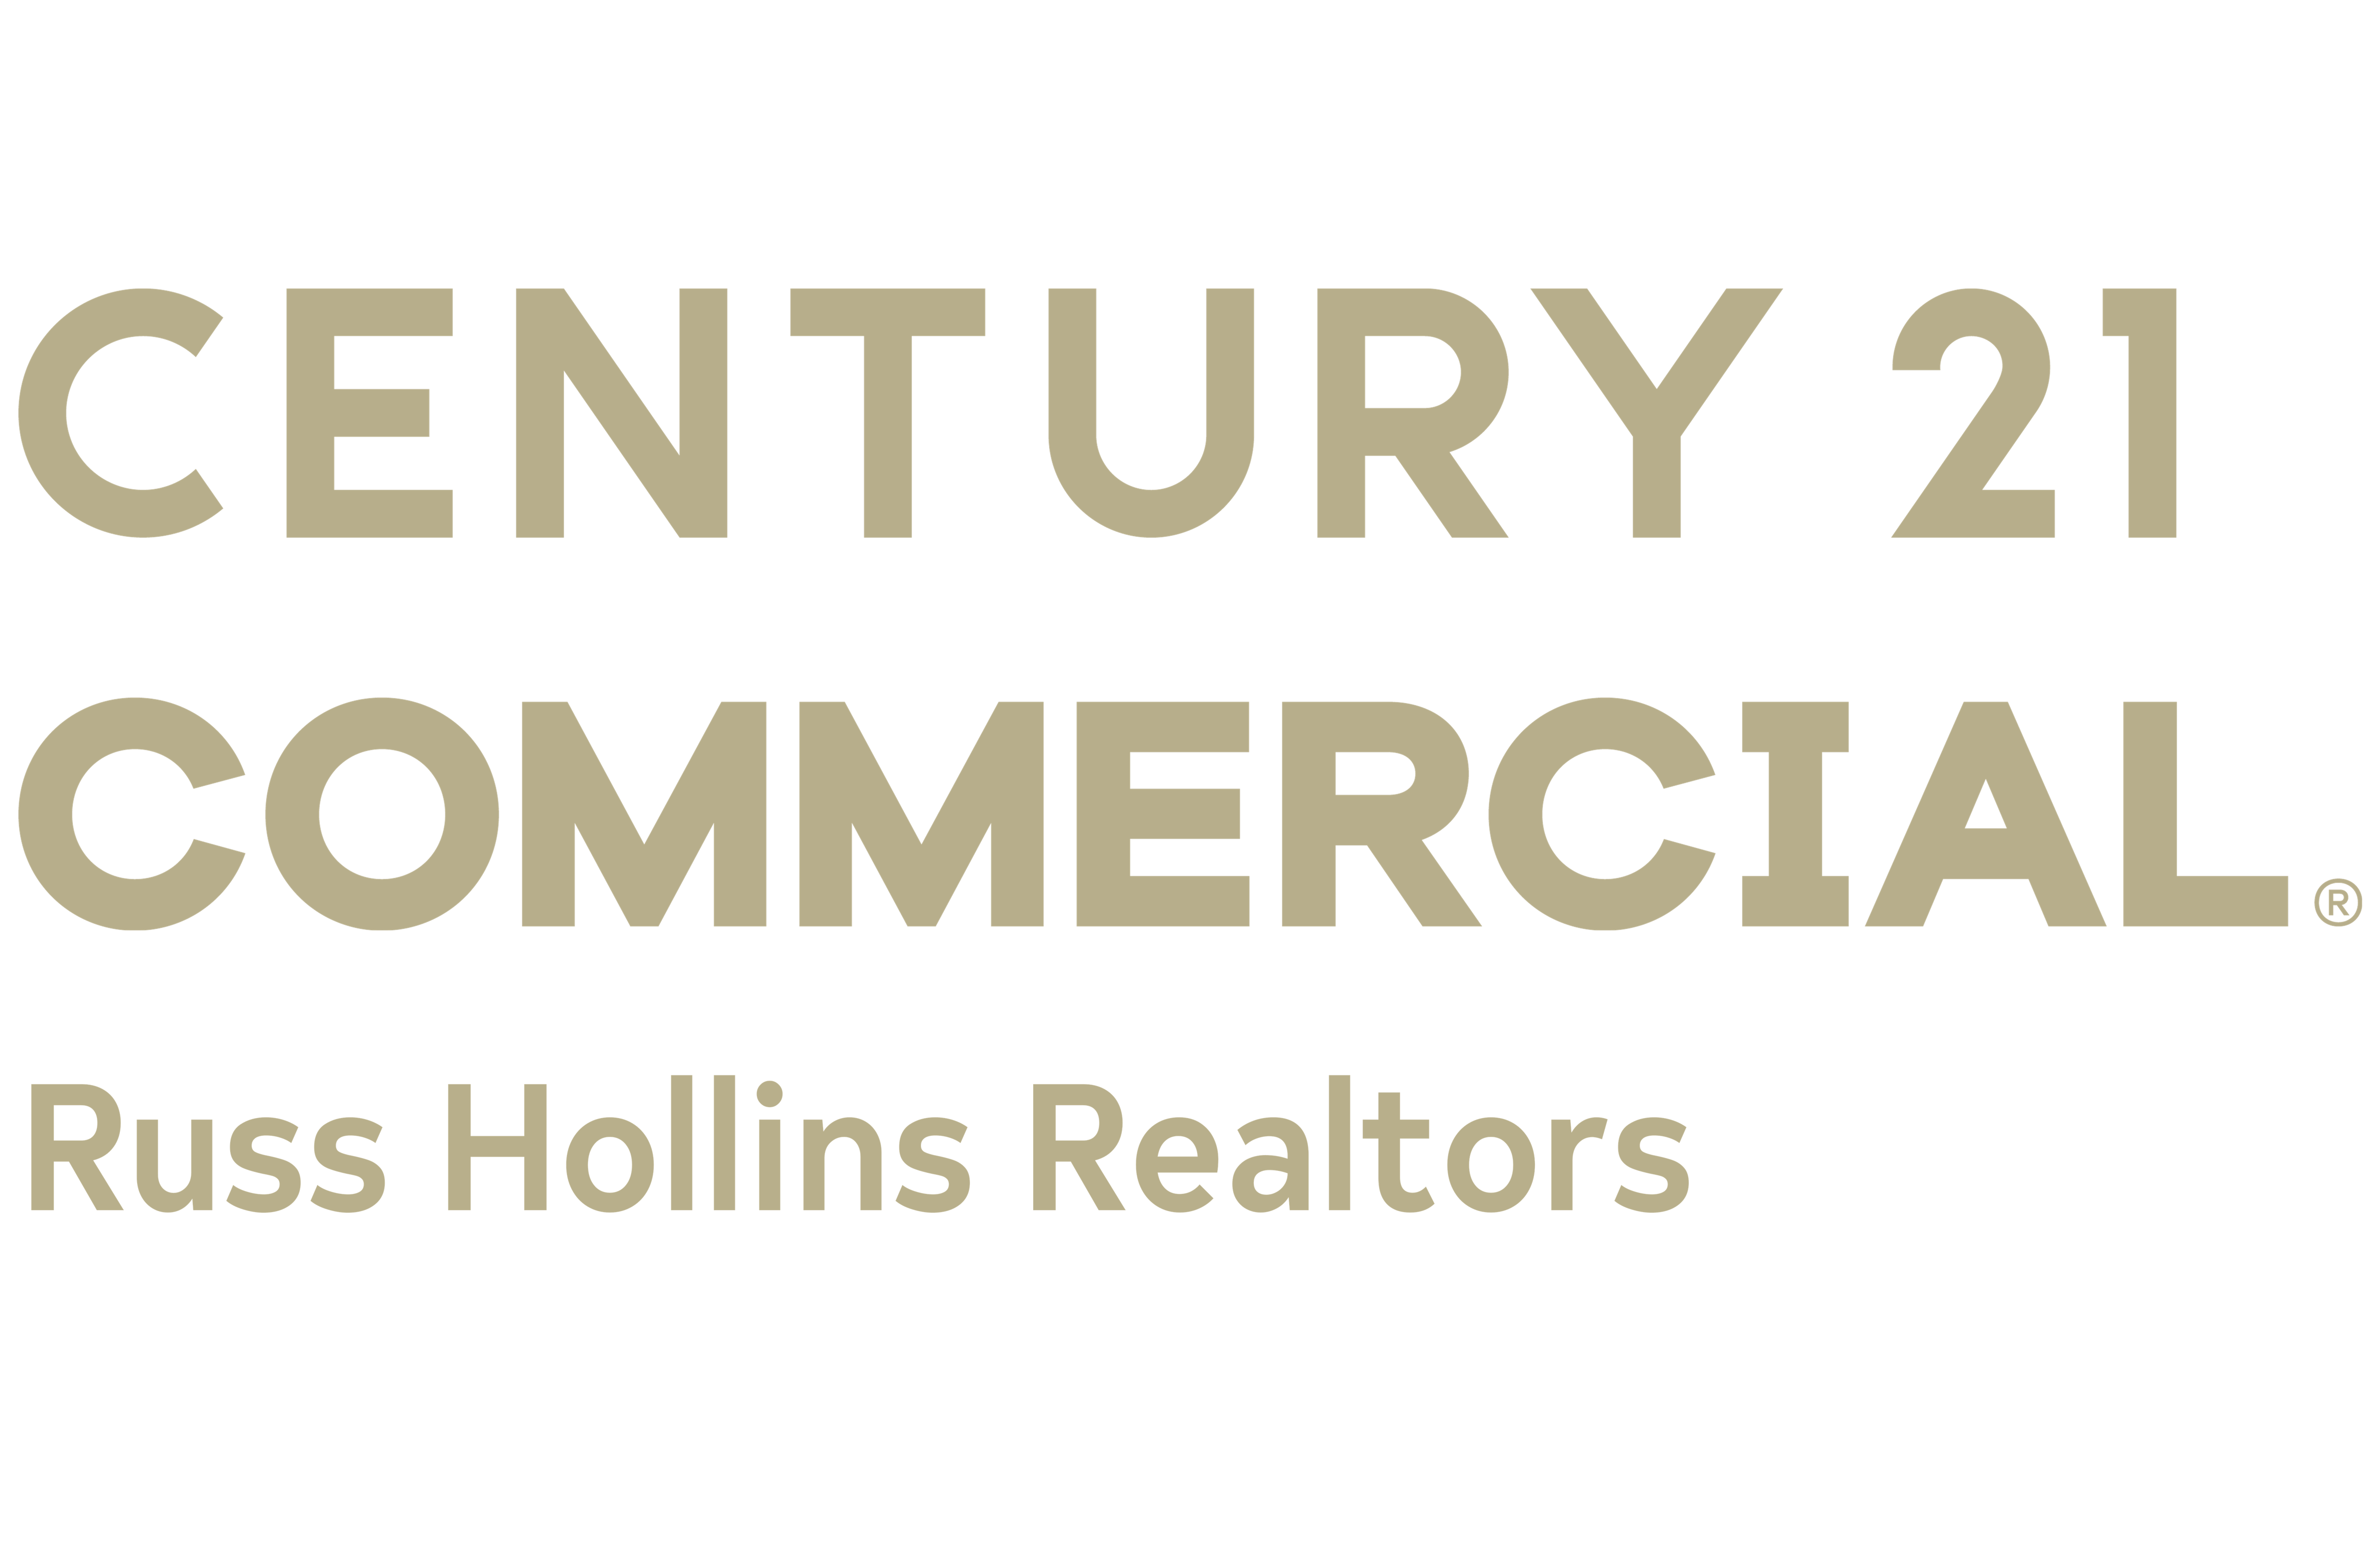 CENTURY 21 Russ Hollins Realtors